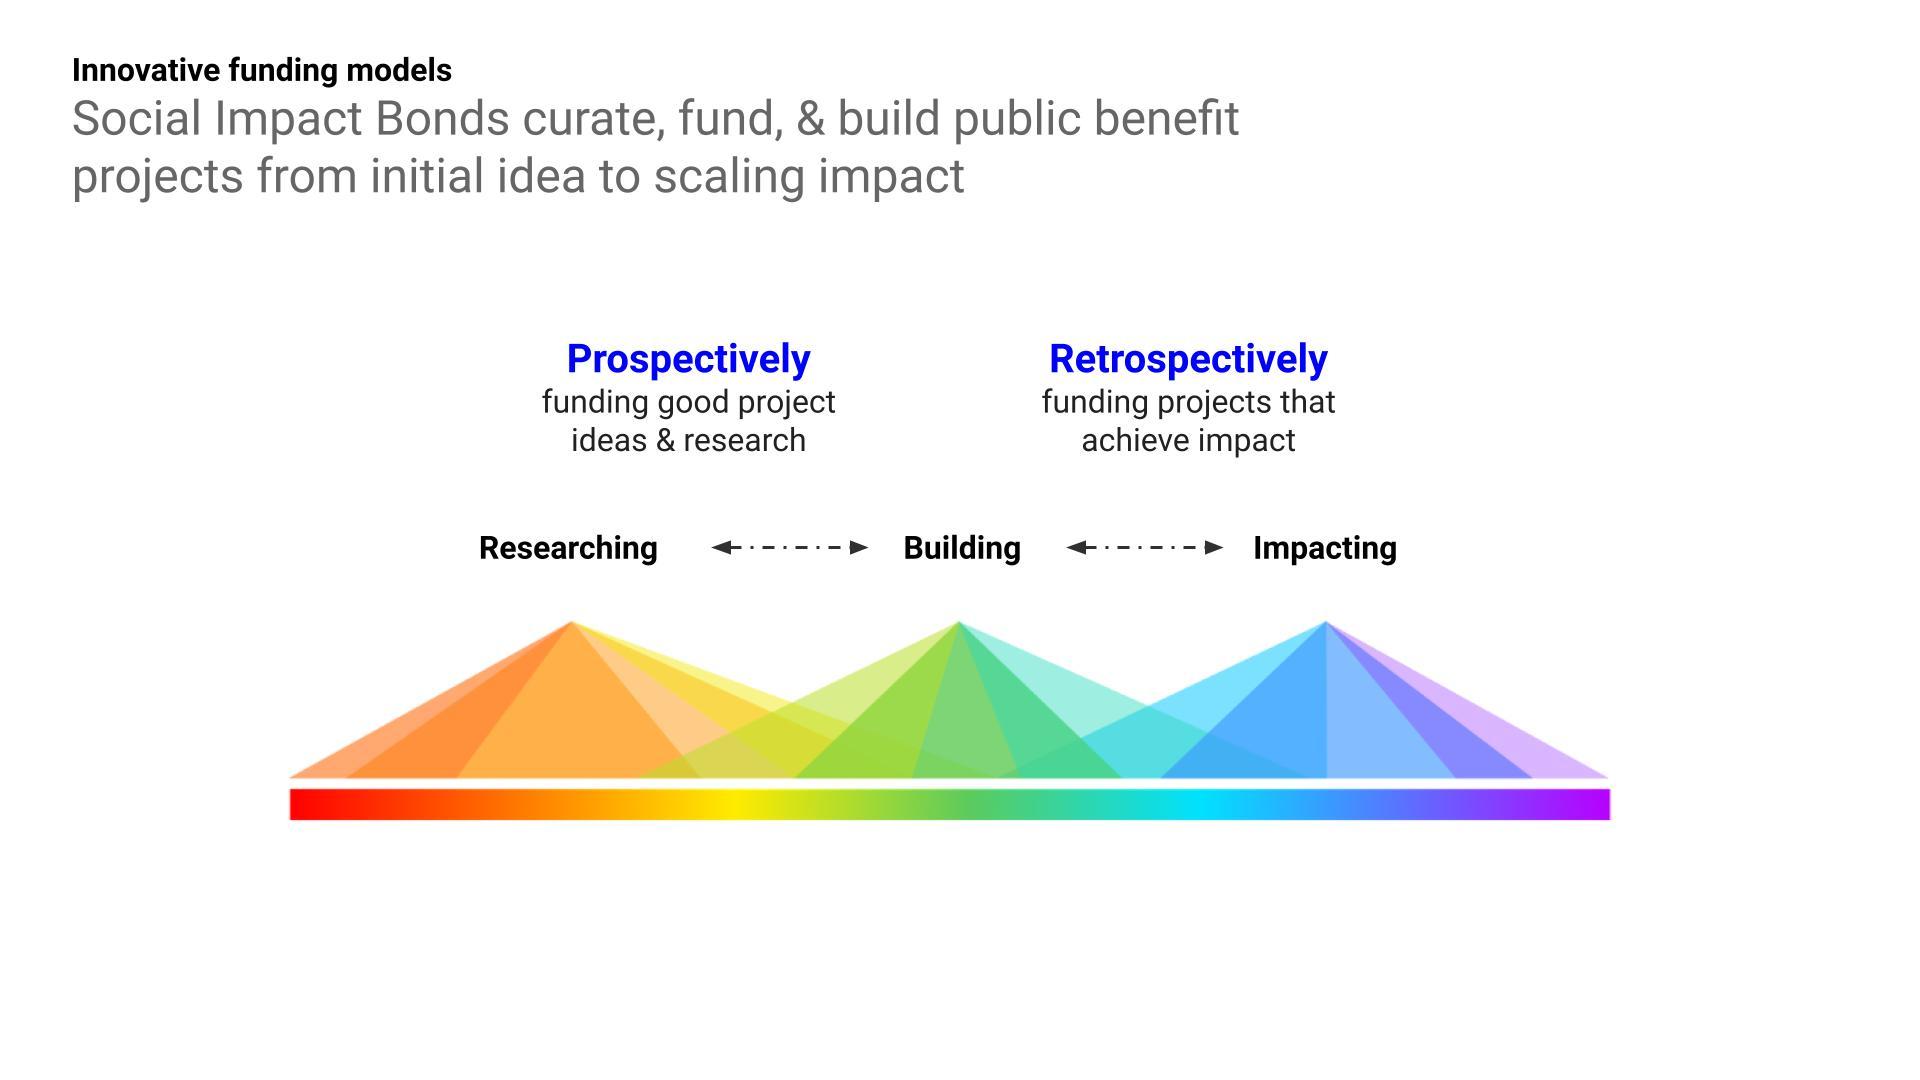 https://ethglobal.s3.amazonaws.com/rec8y7zUS8H97bpVH/Innovative_Funding_Models.jpg